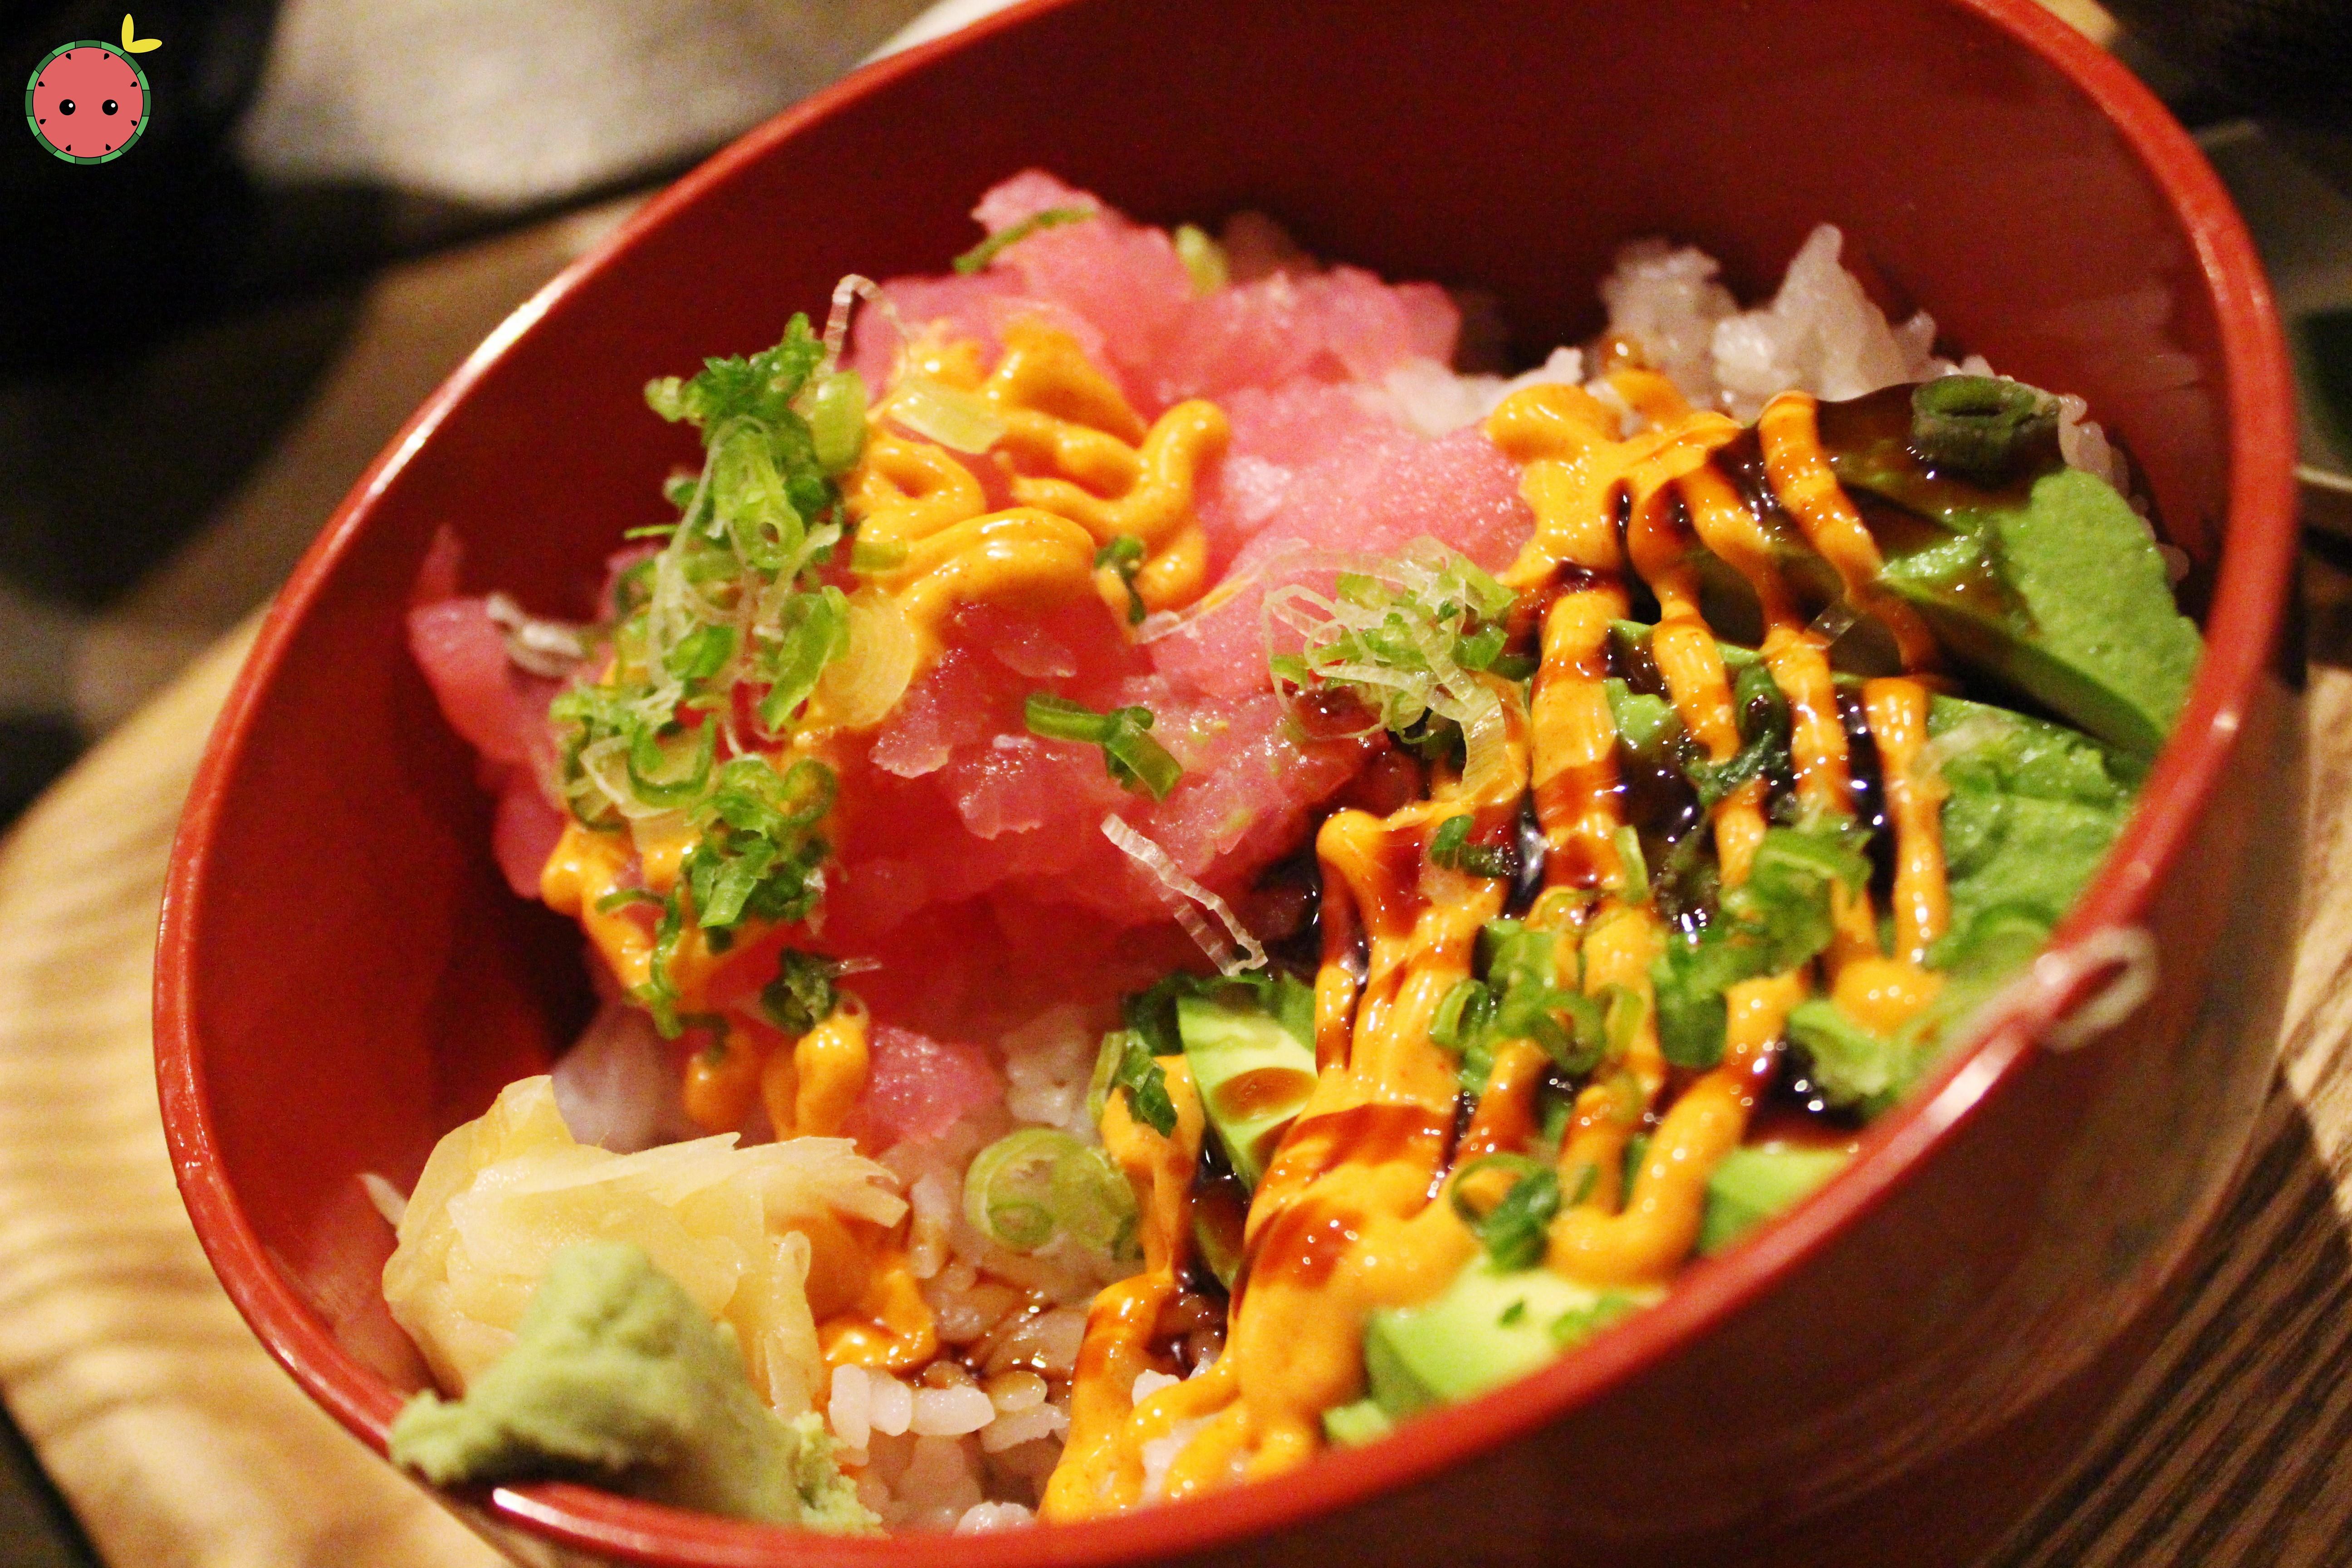 Tuna Tartar Don - Chopped tuna sashimi with avocado and spicy mayonnaise over rice